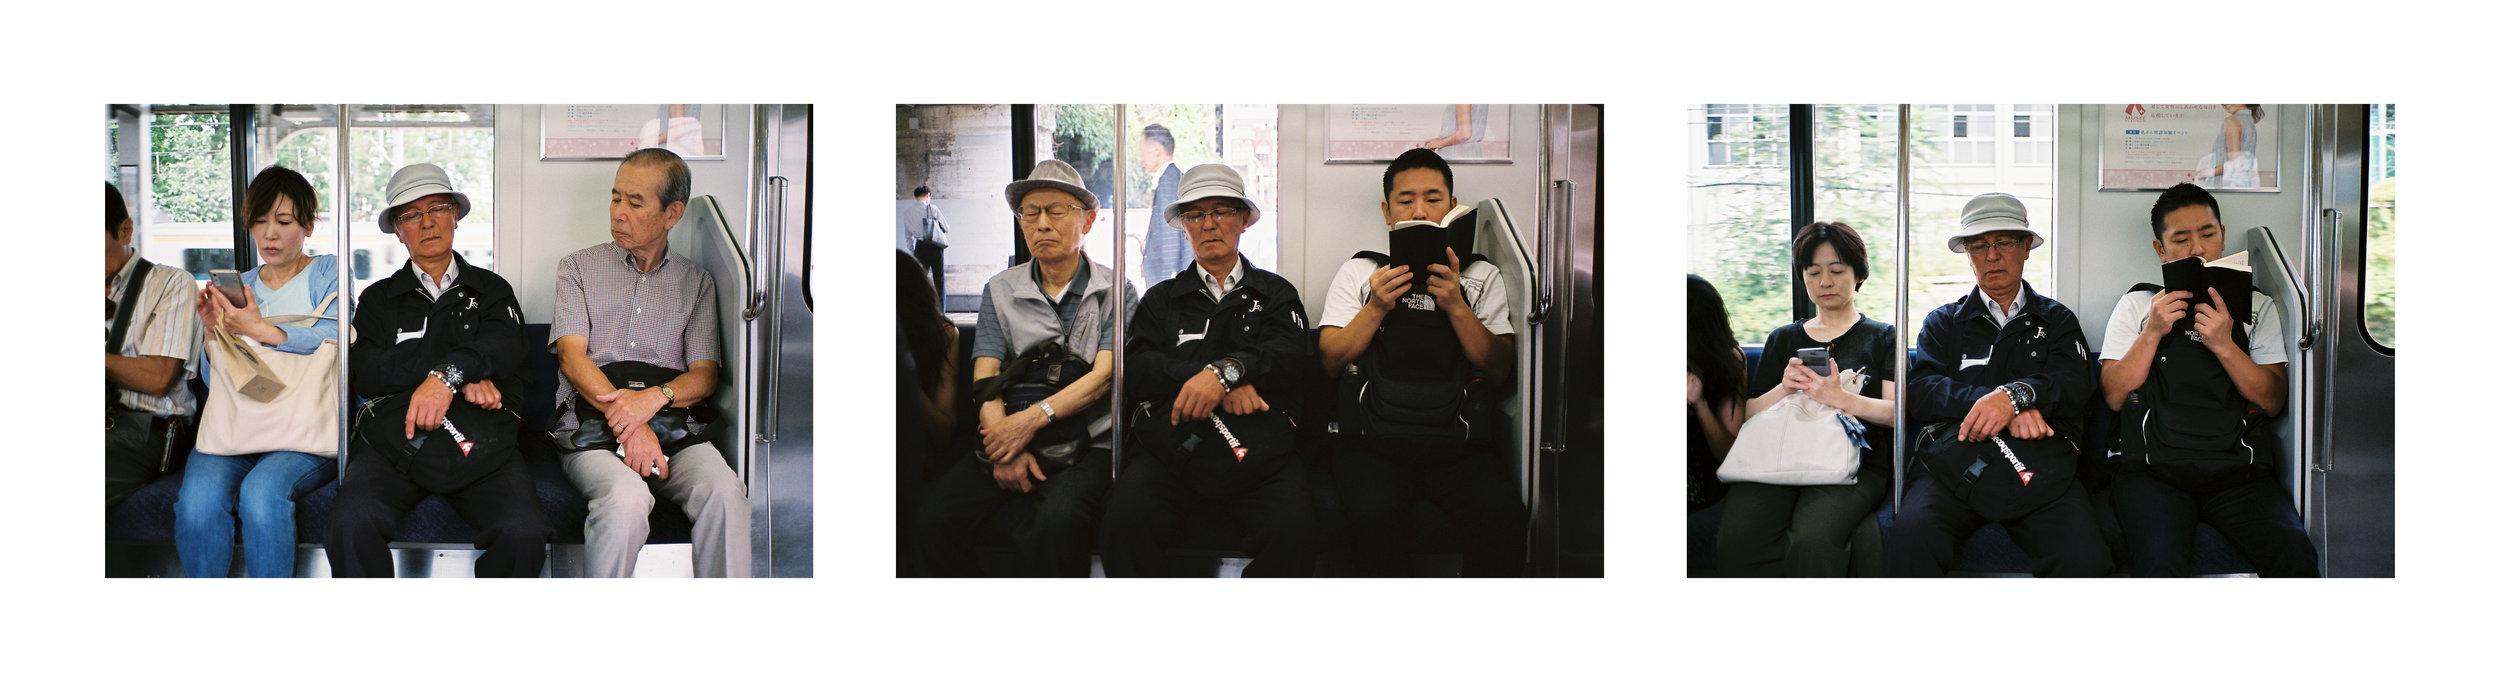 train 3.jpg